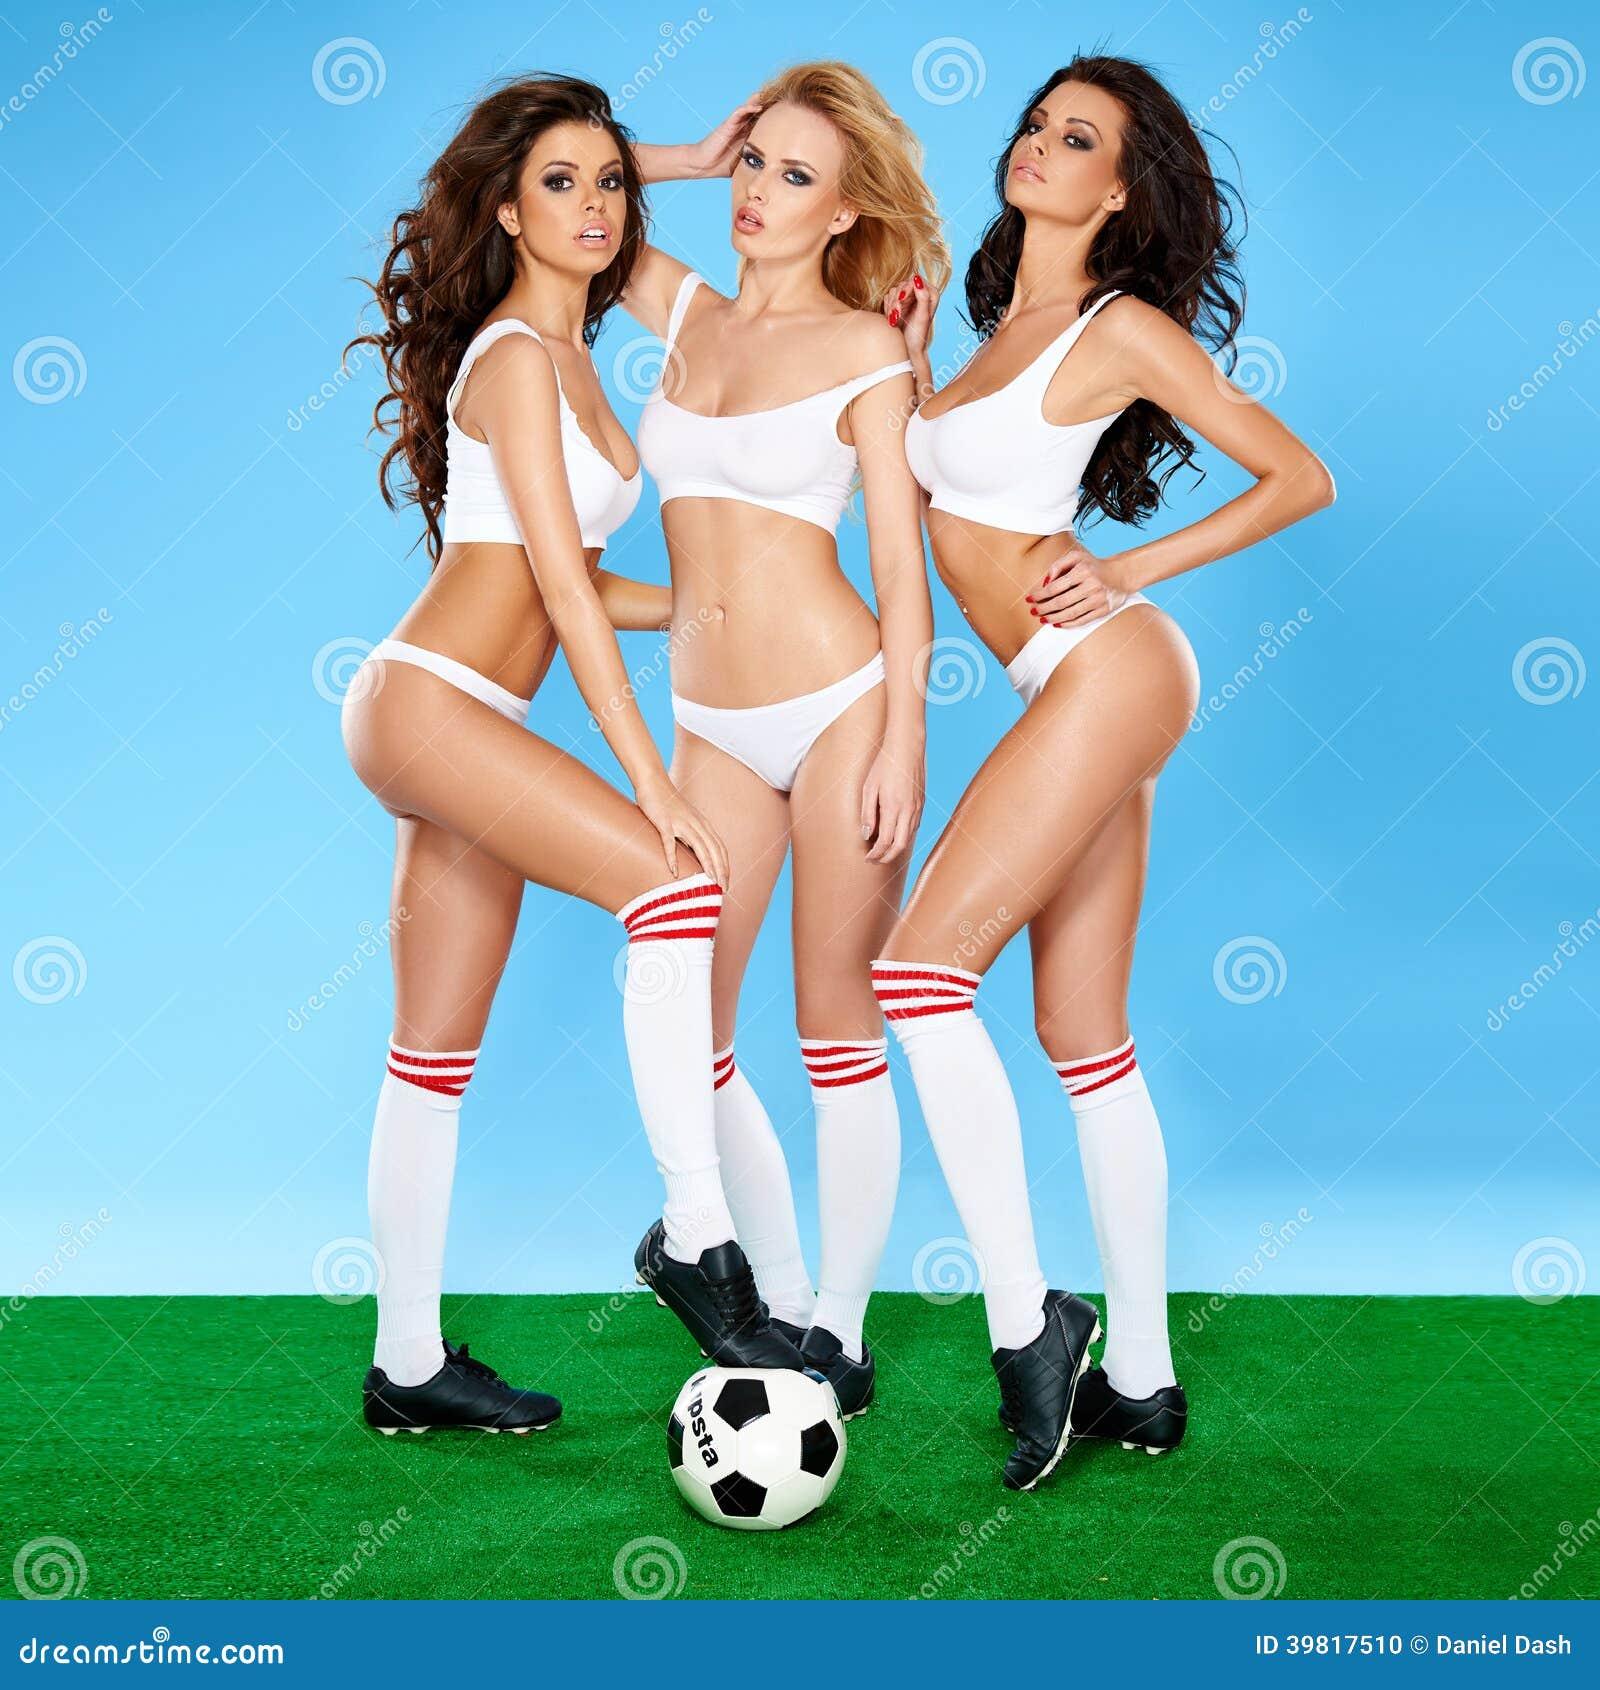 Three Beautiful Women Soccer Players Stock Photo